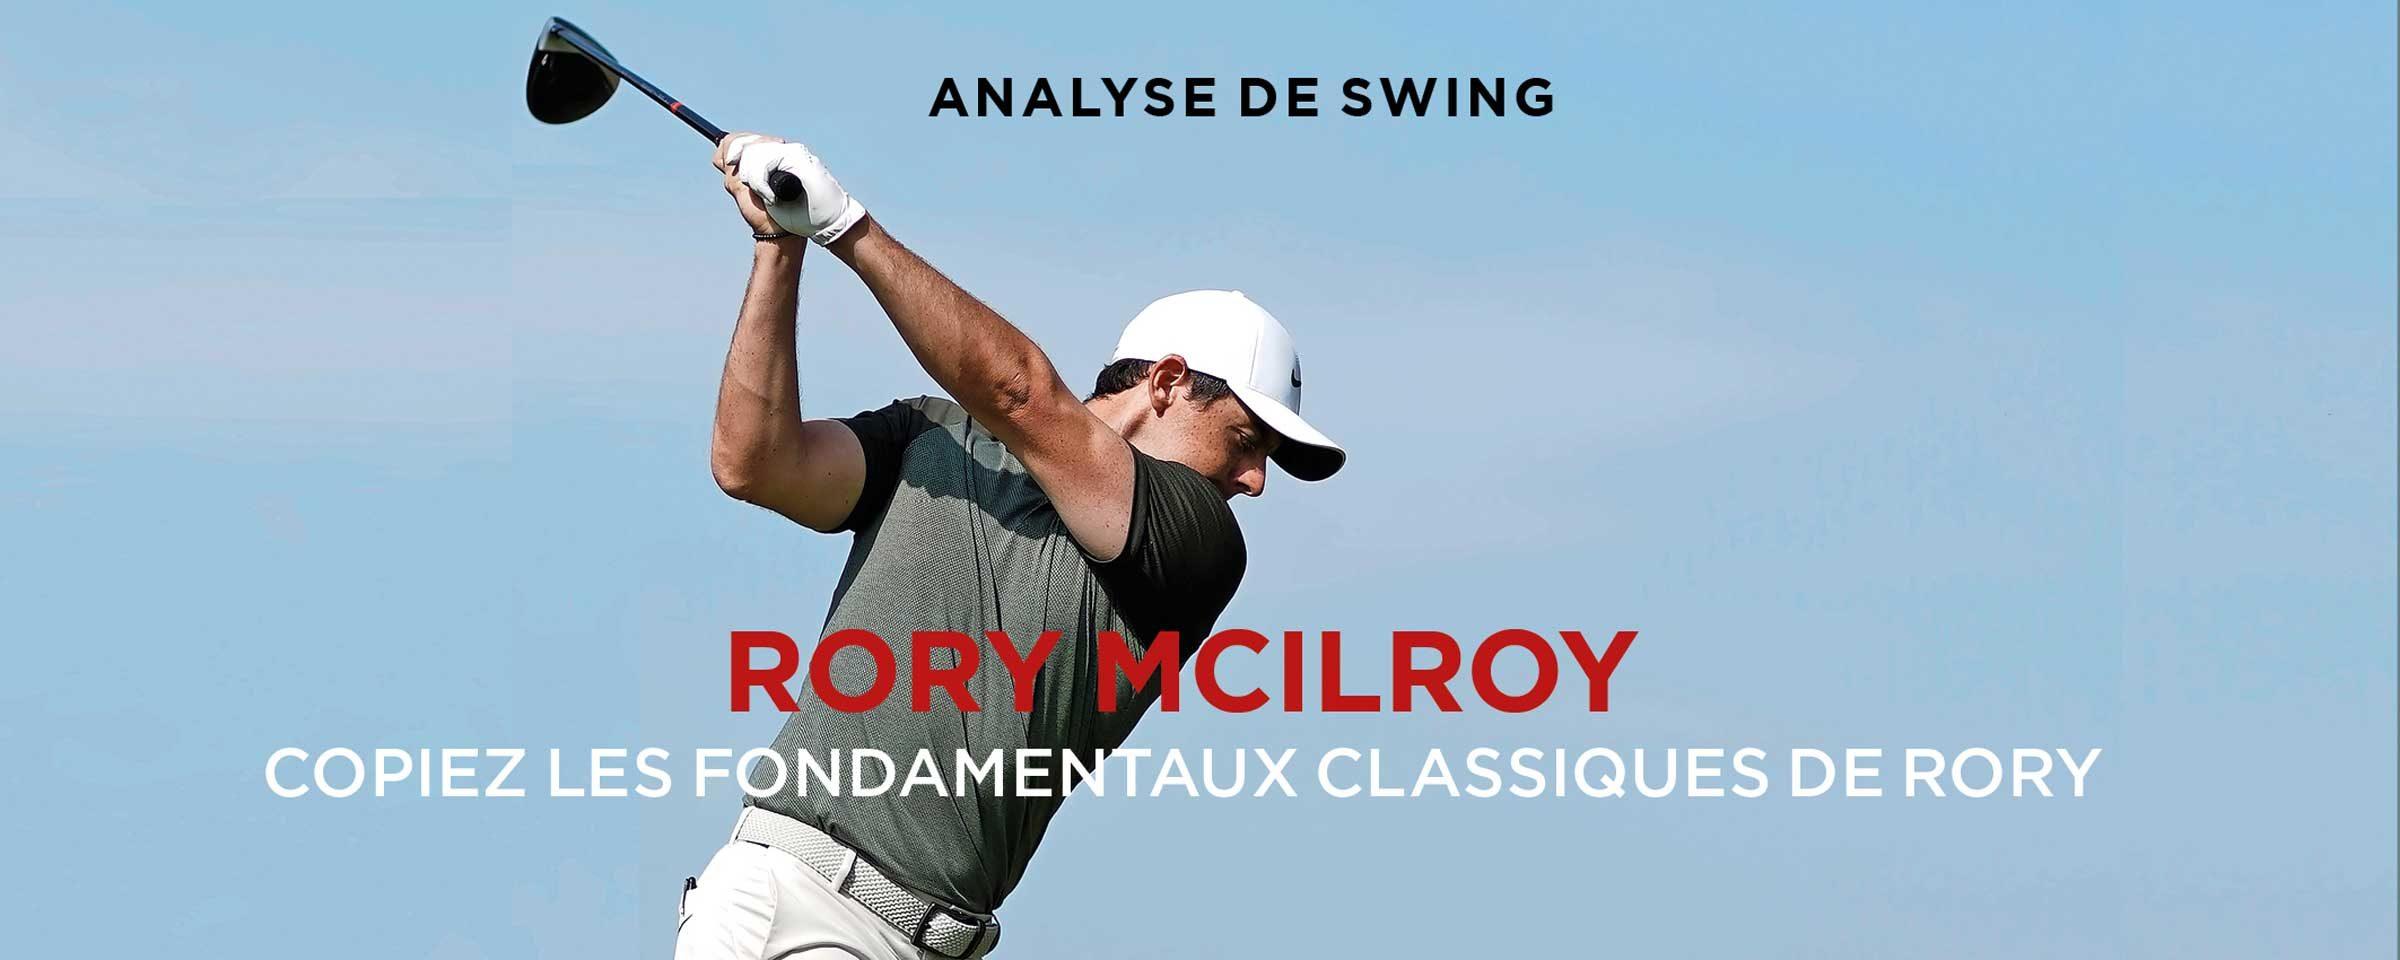 Swing Rory